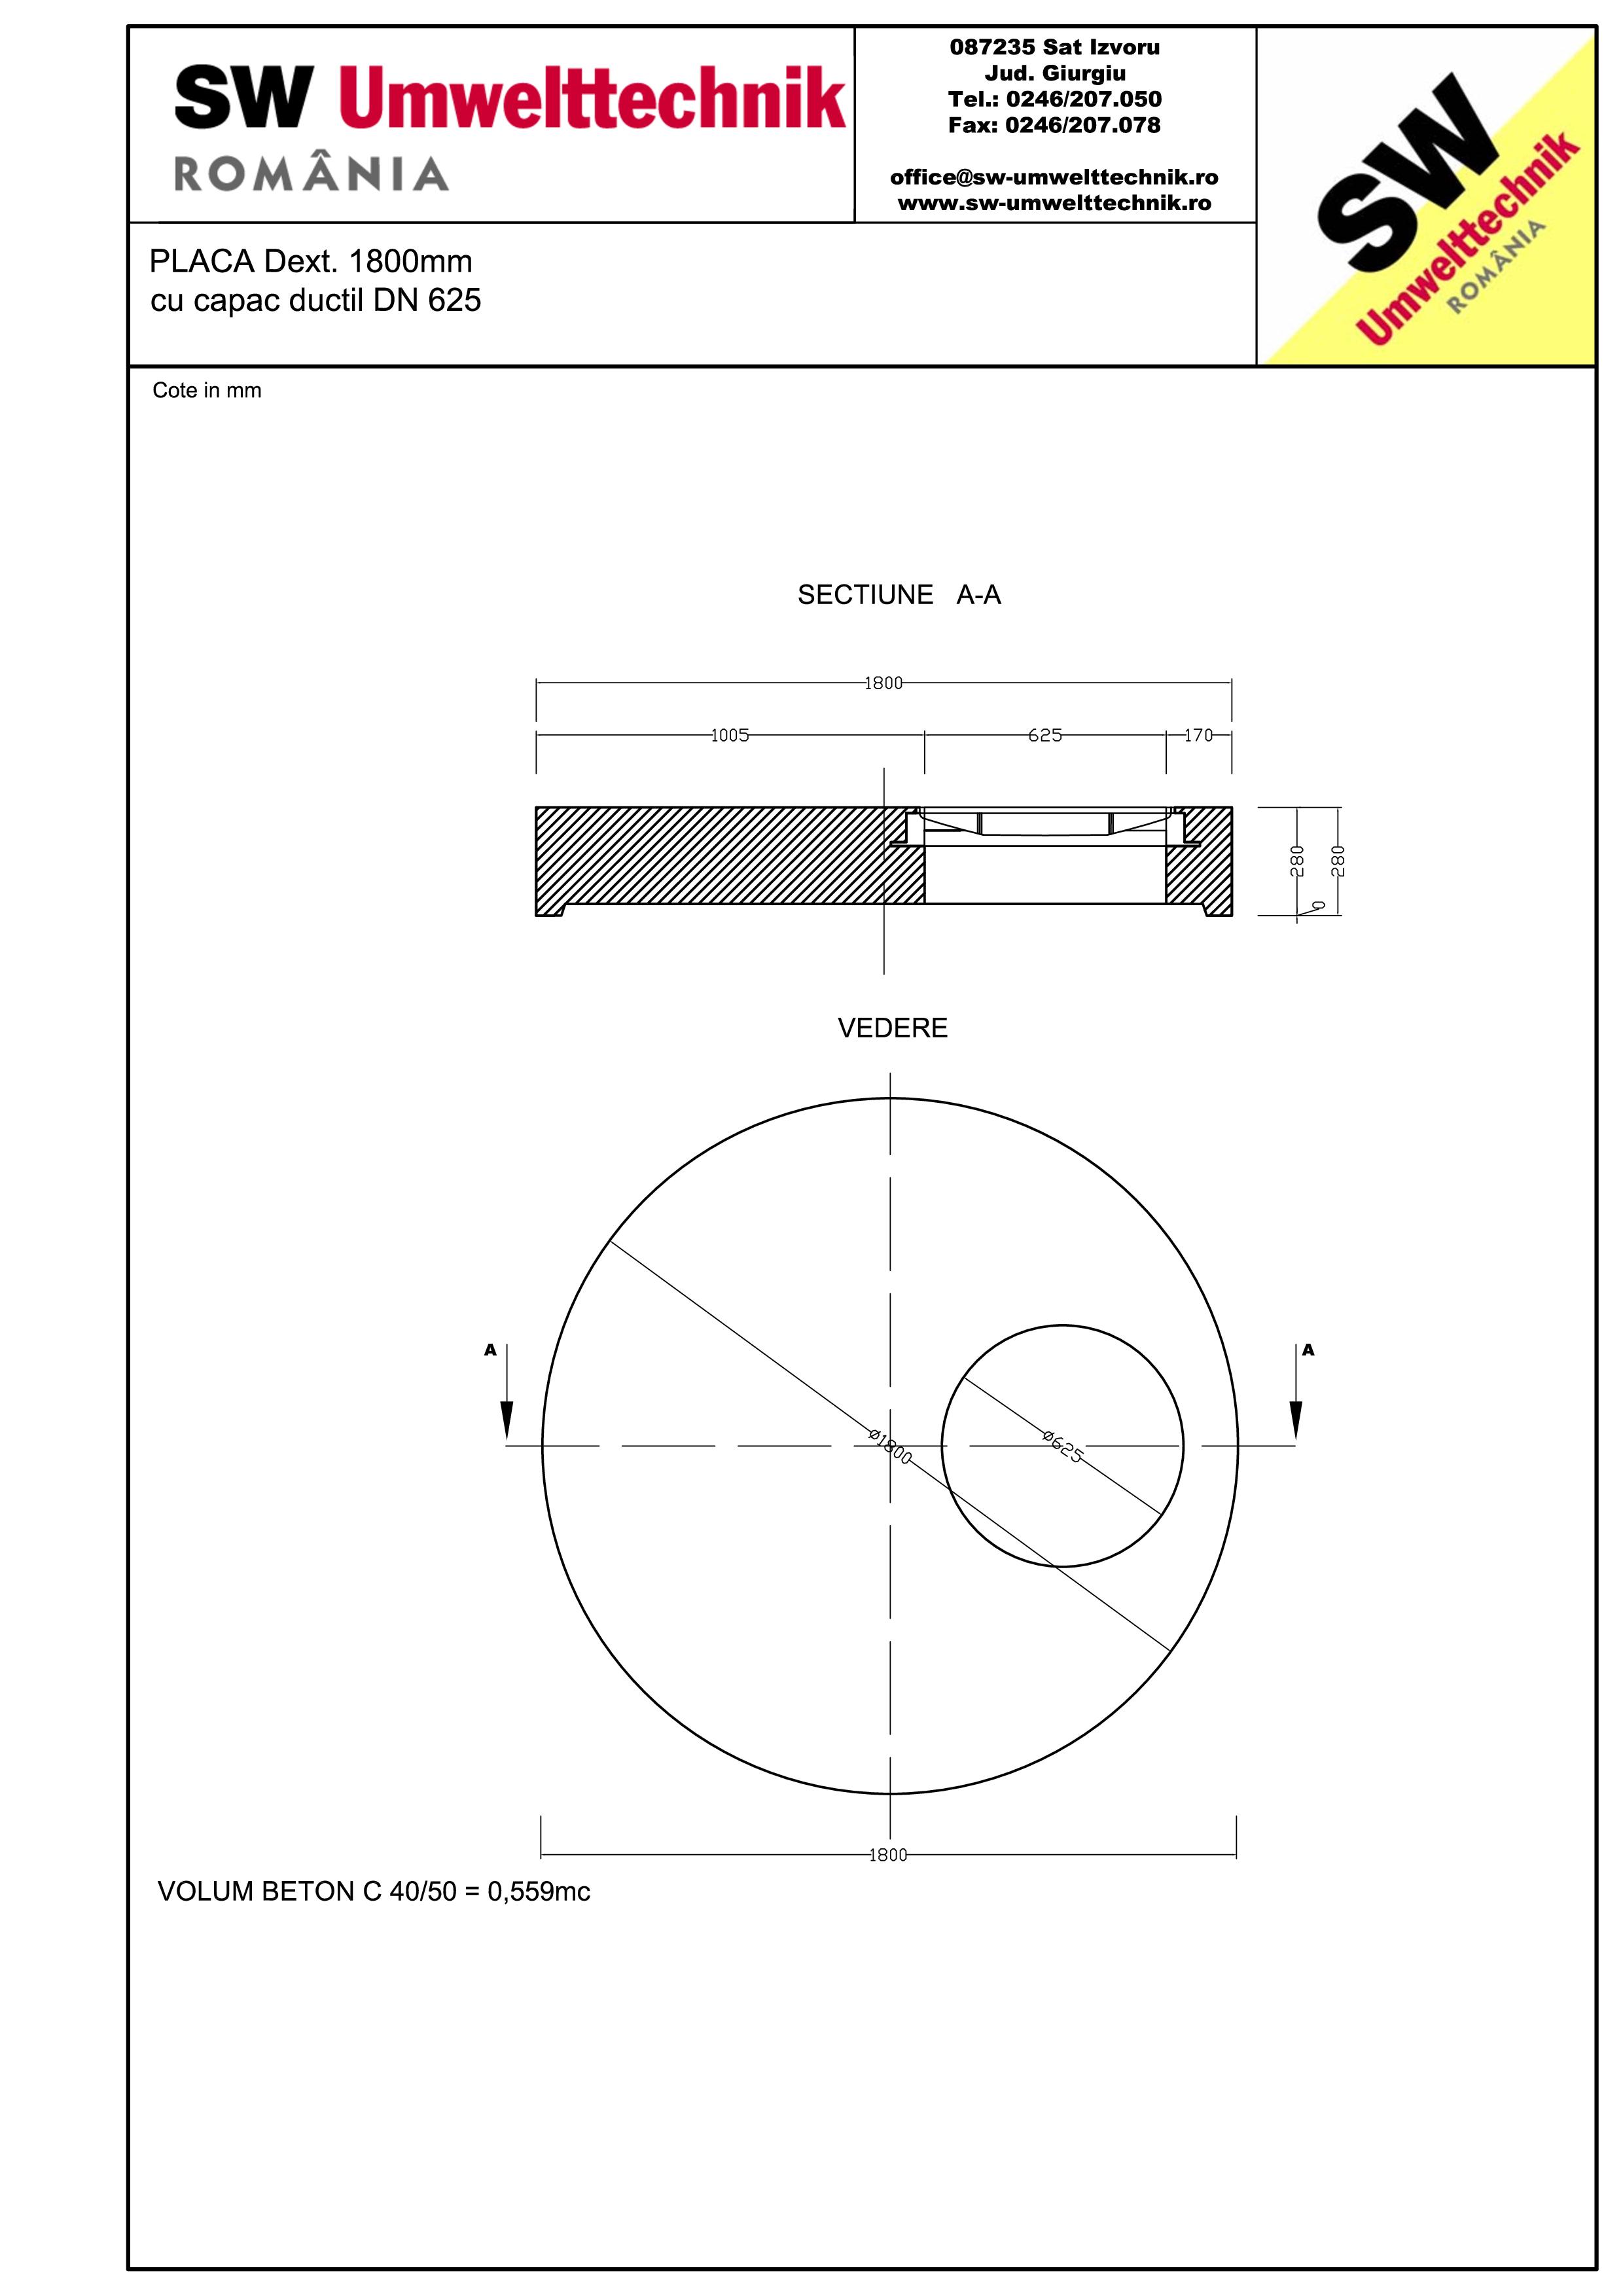 Pagina 1 - CAD-PDF Placa Dext.1800 H250 cu capac ductil DN625 SW UMWELTTECHNIK Detaliu de produs